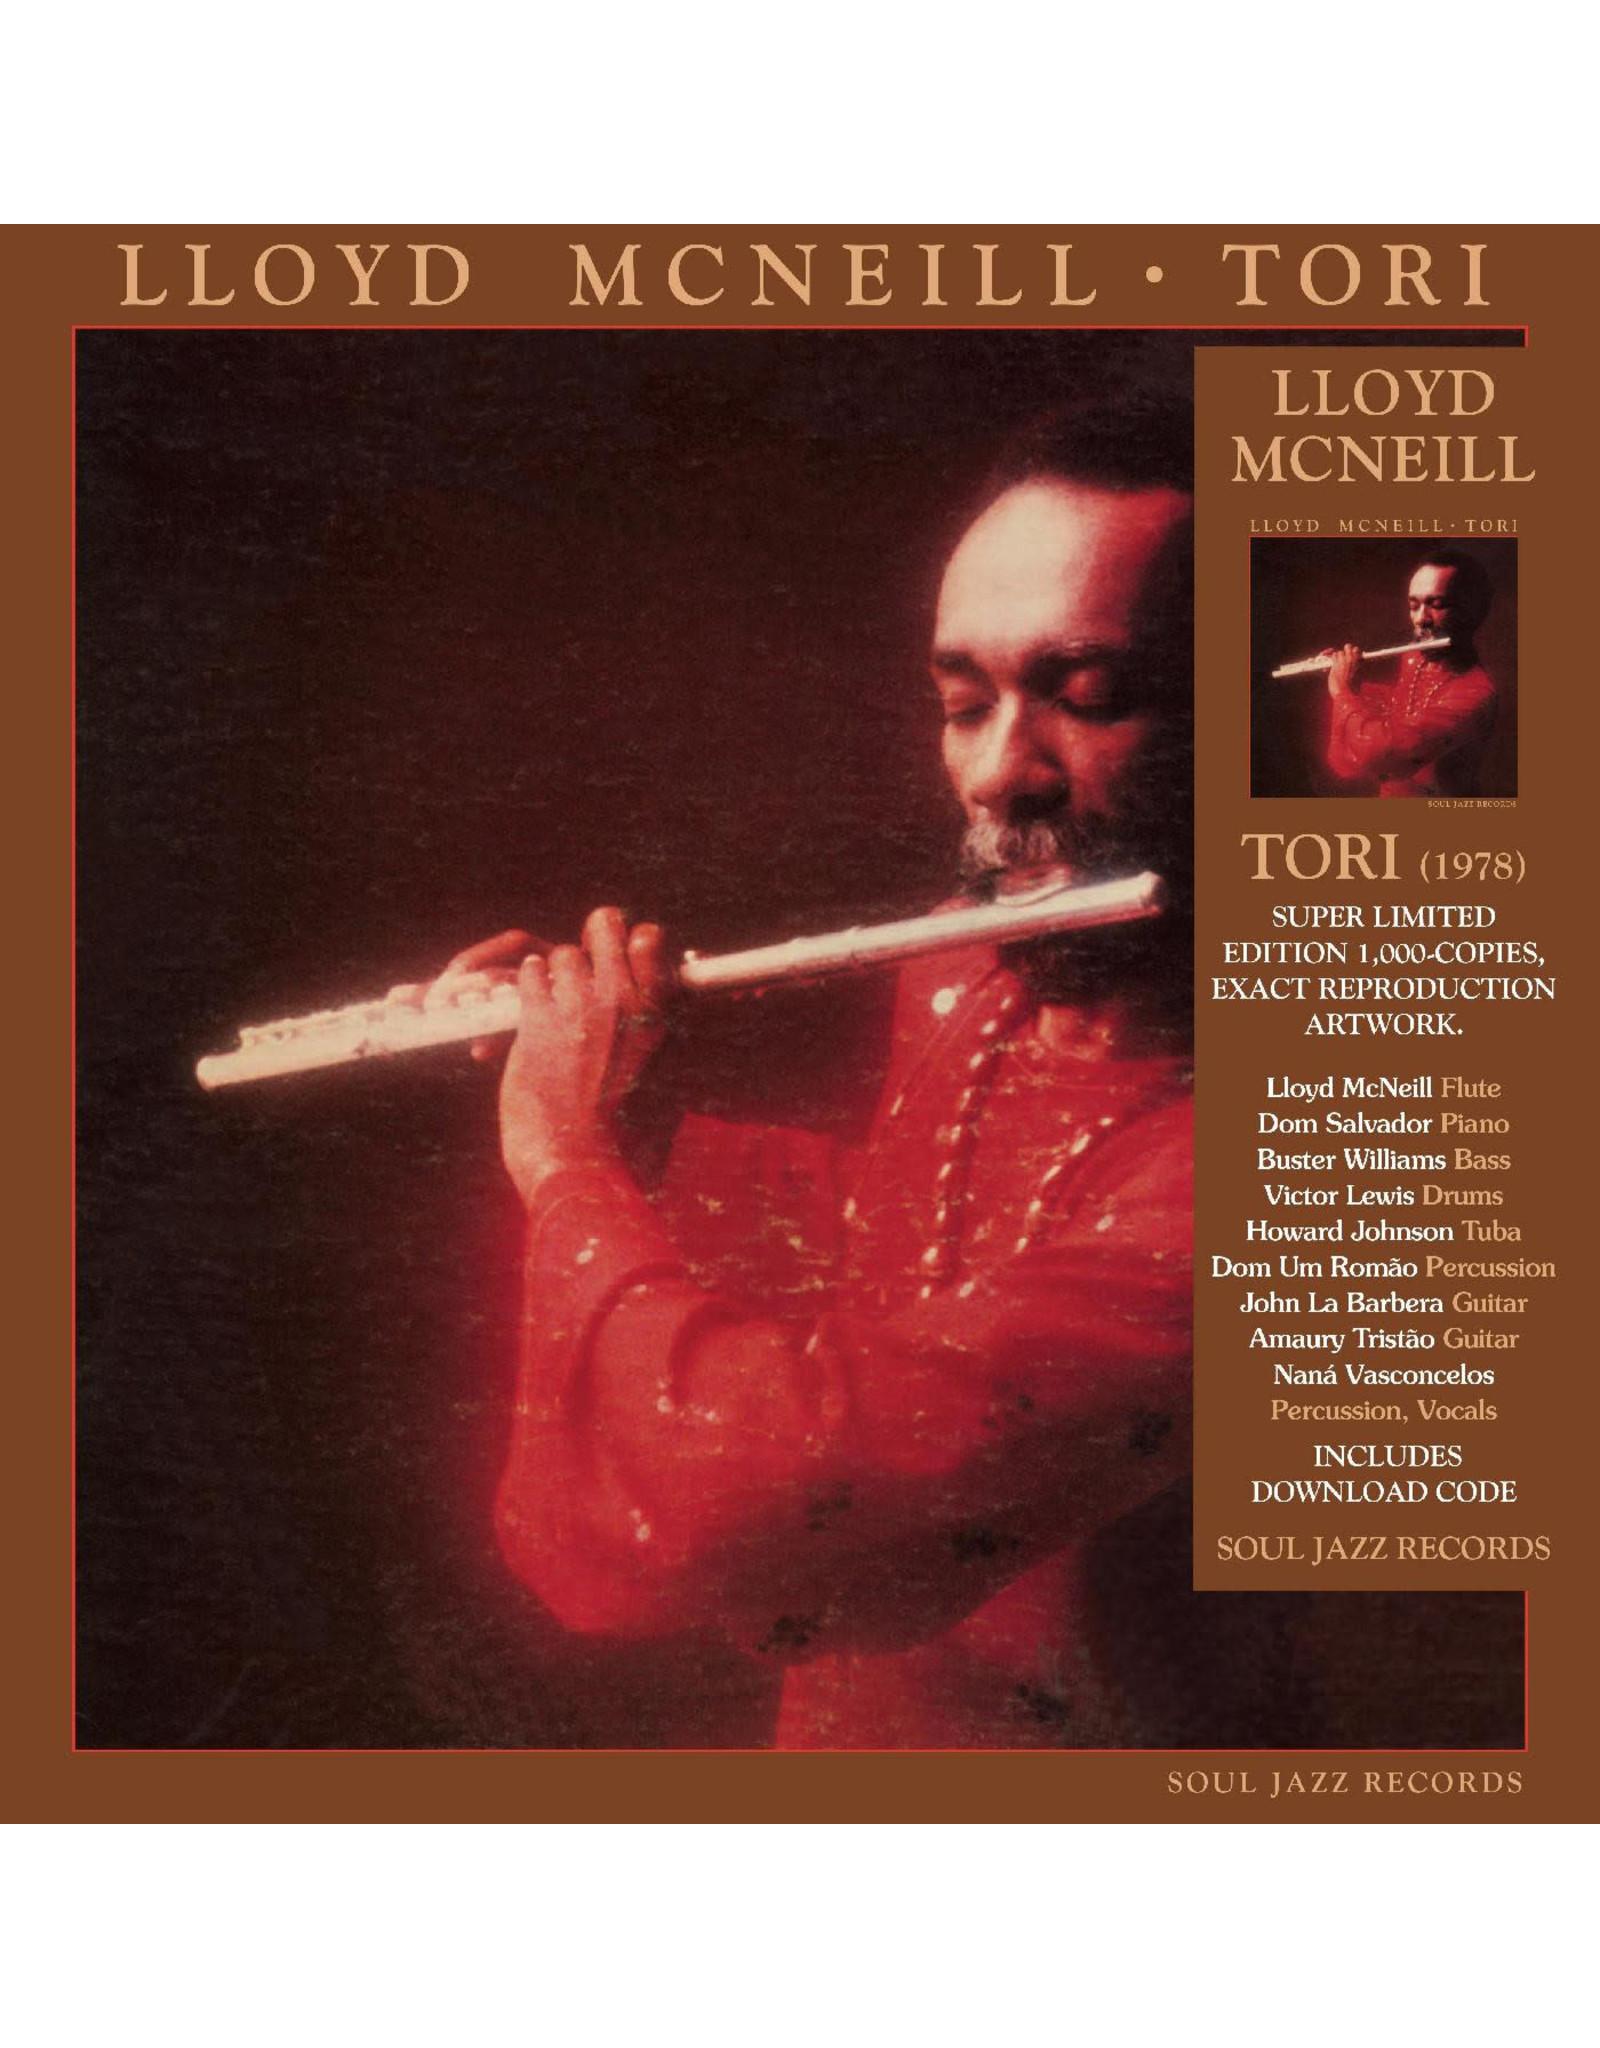 New Vinyl Lloyd McNeill - Tori LP